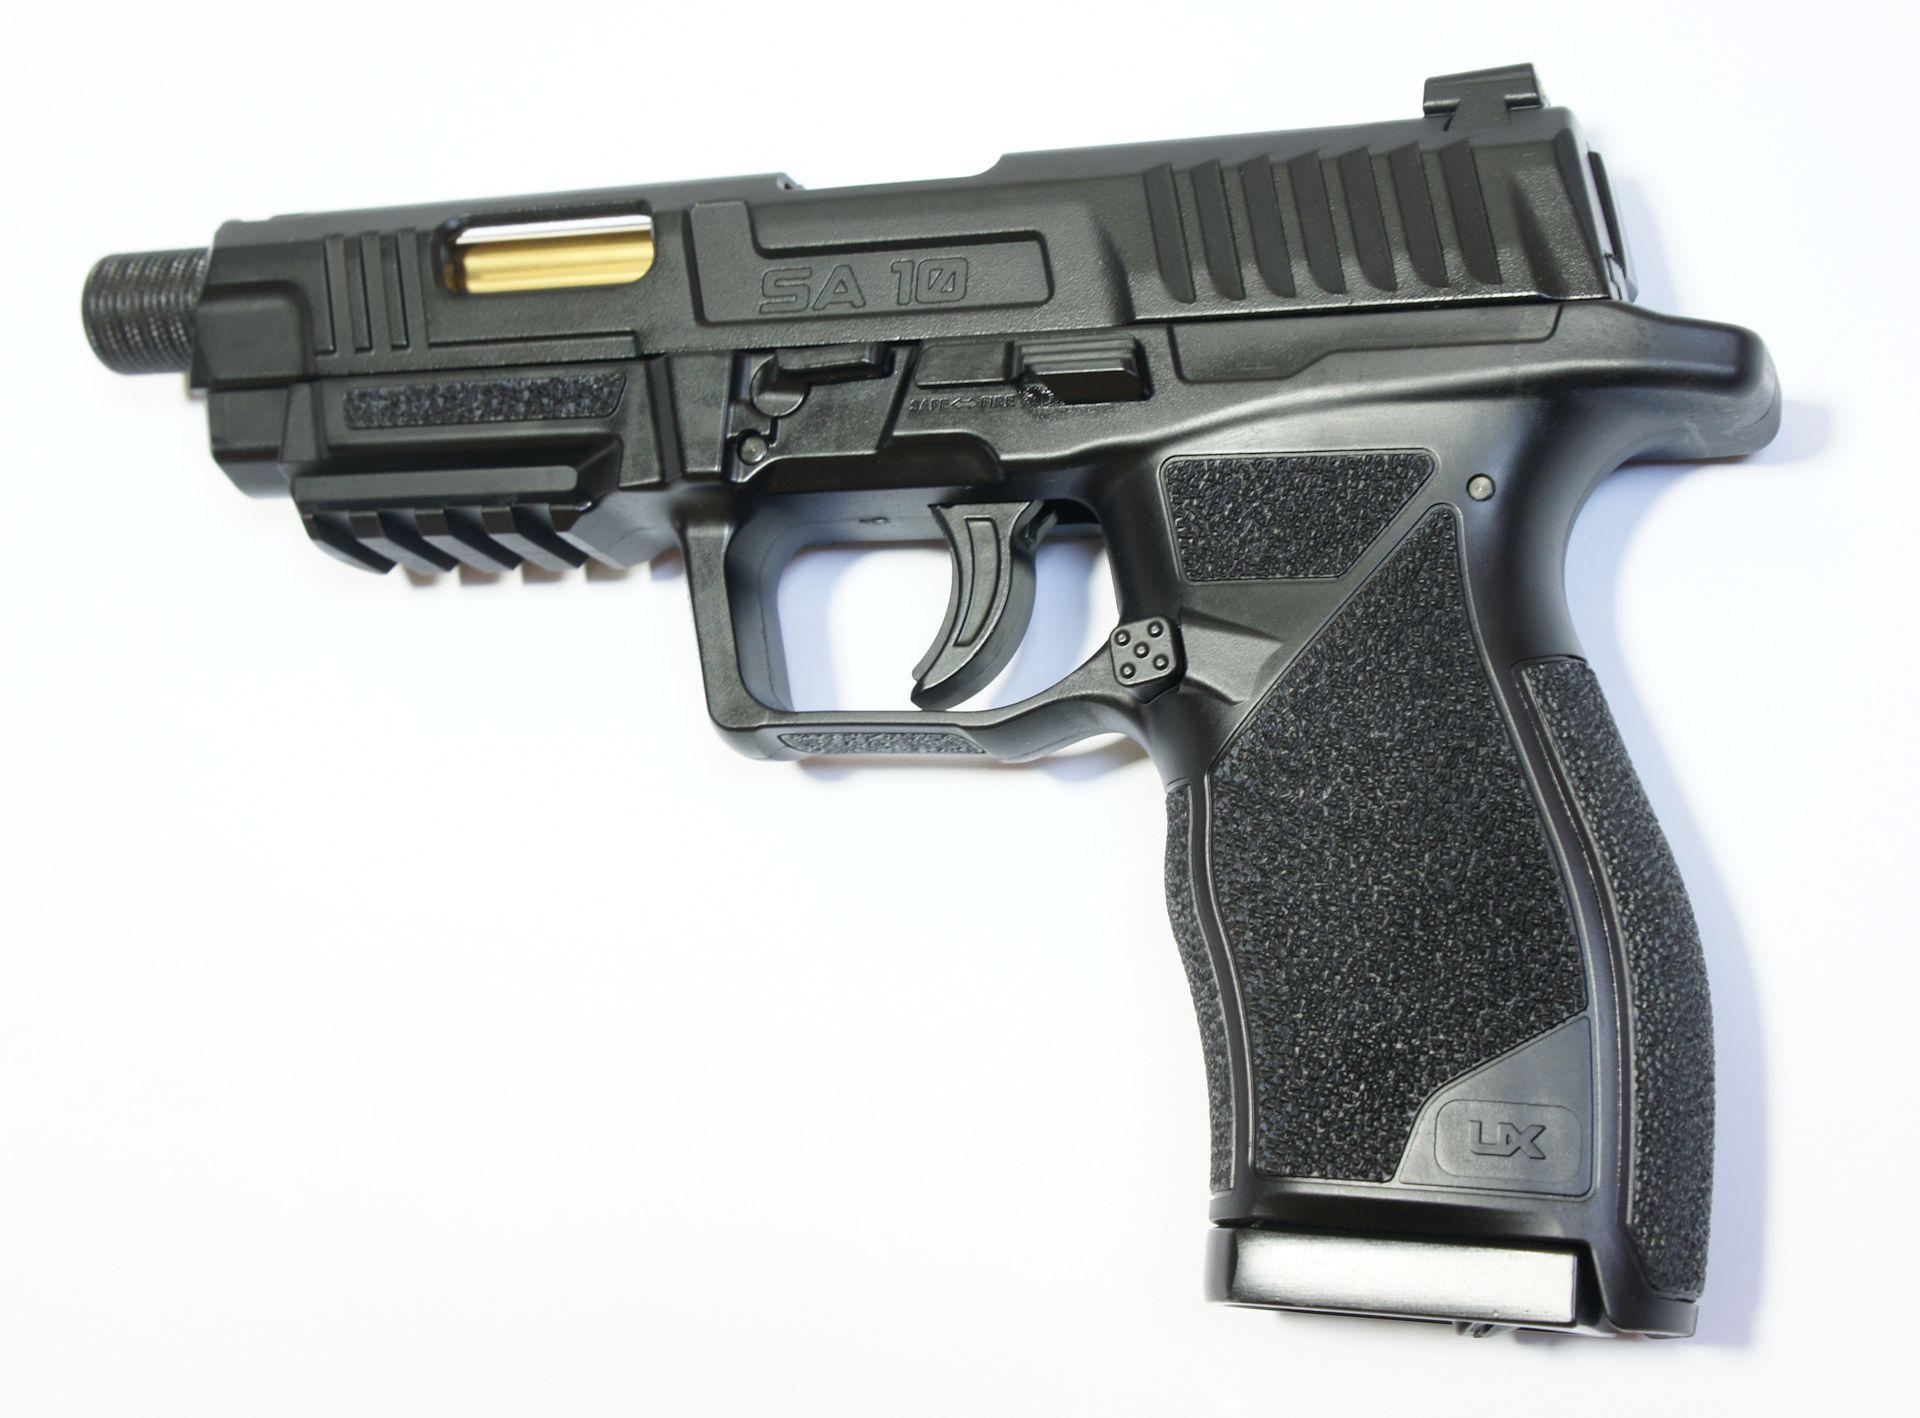 UX Umarex SA 10 CO2-Pistole - 4,5 mm